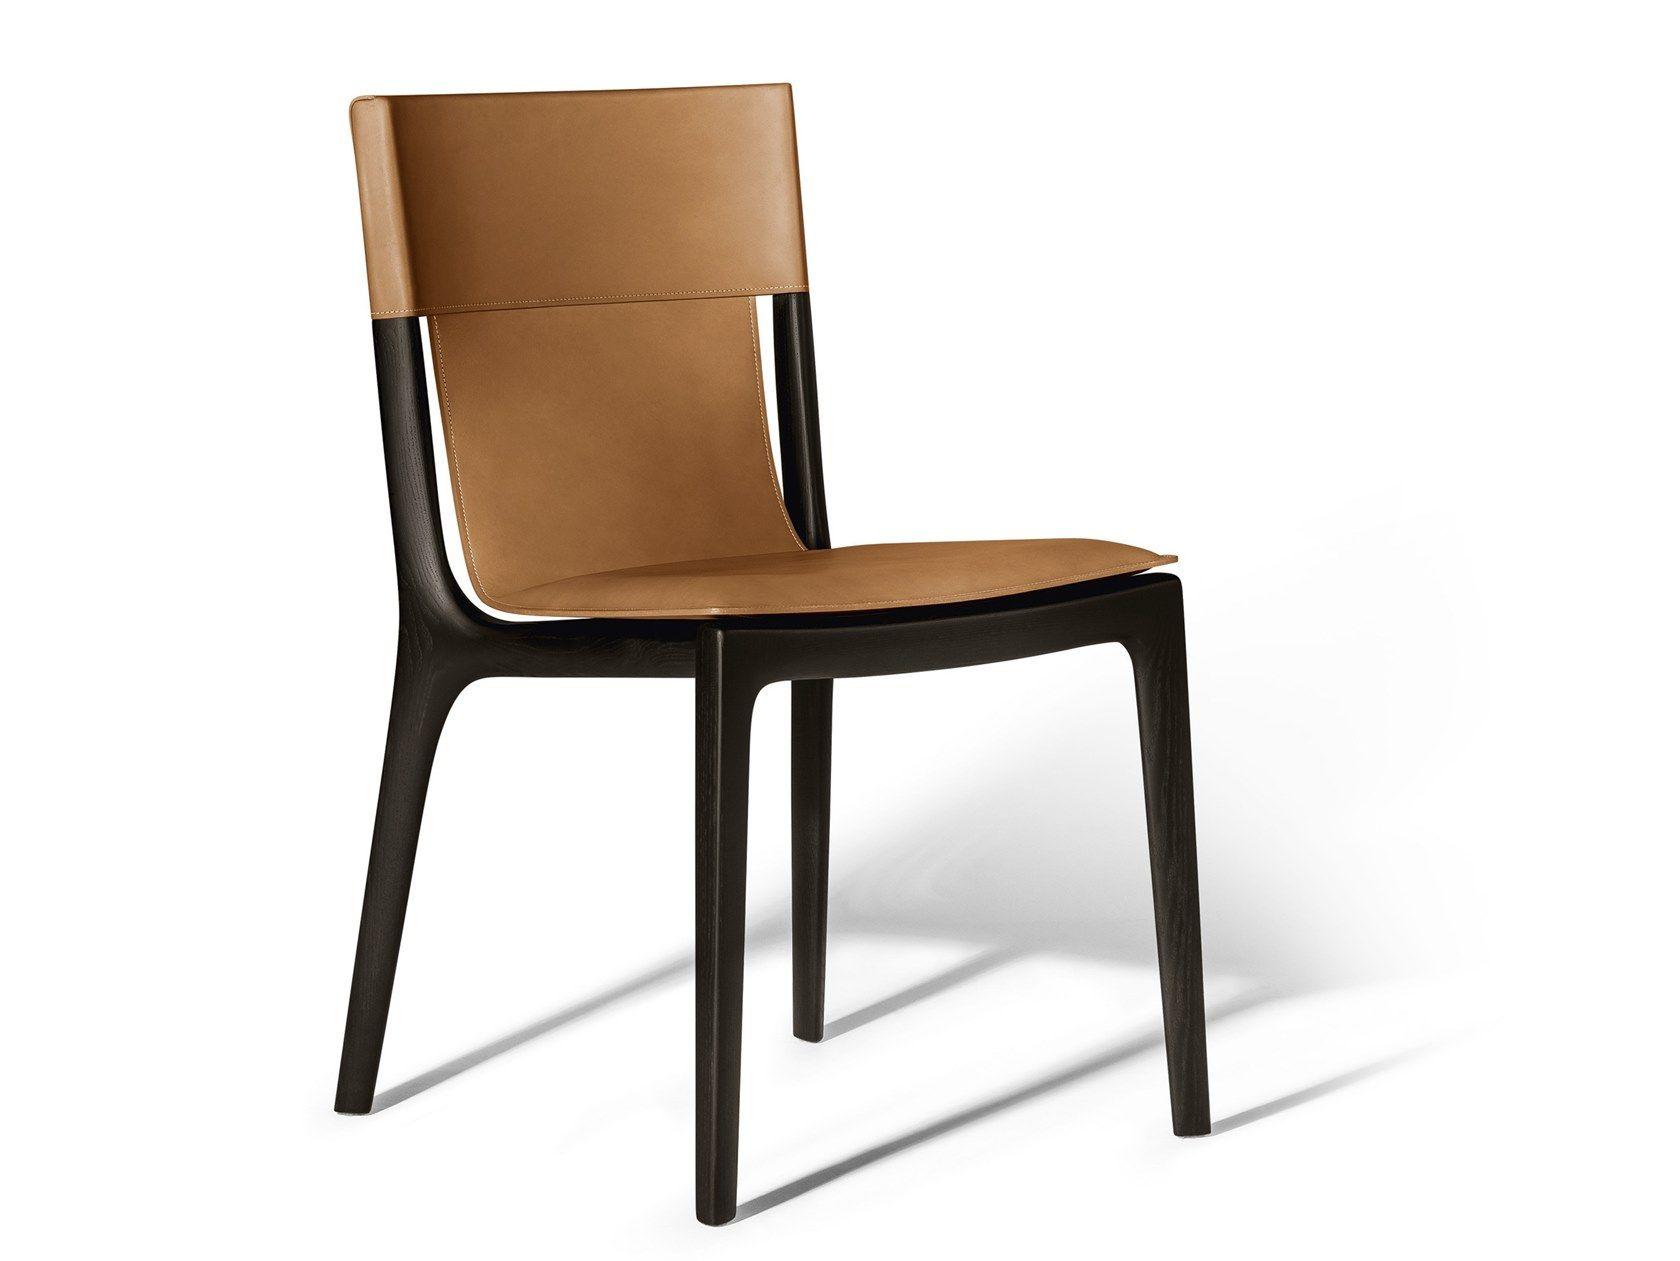 Sedia in cuoio ISADORA by Poltrona Frau | Sedie in pelle ...